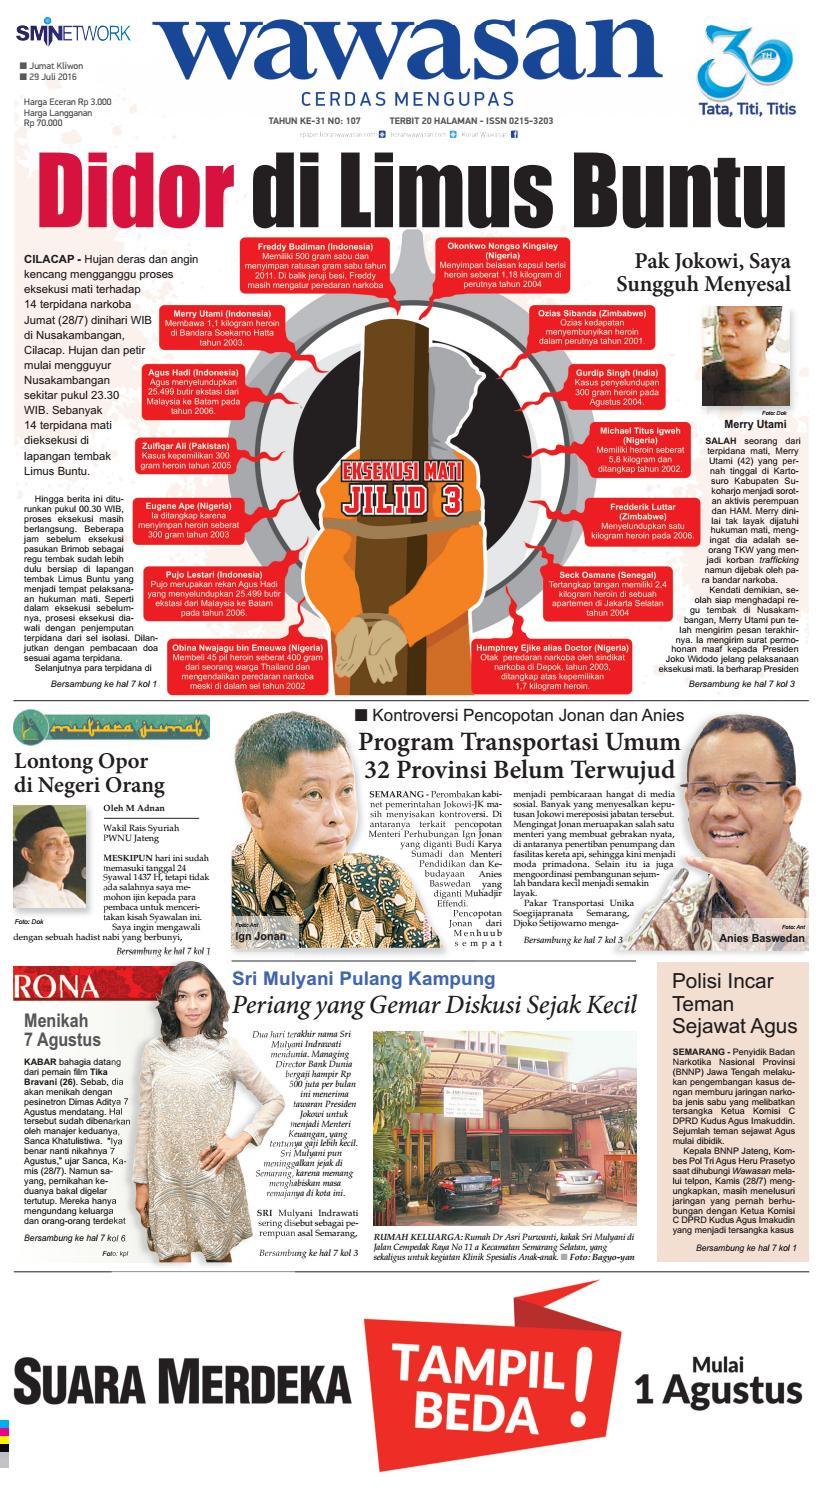 WAWASAN 29 Juli 2016 by KORAN PAGI WAWASAN - issuu 35c94ef3fb